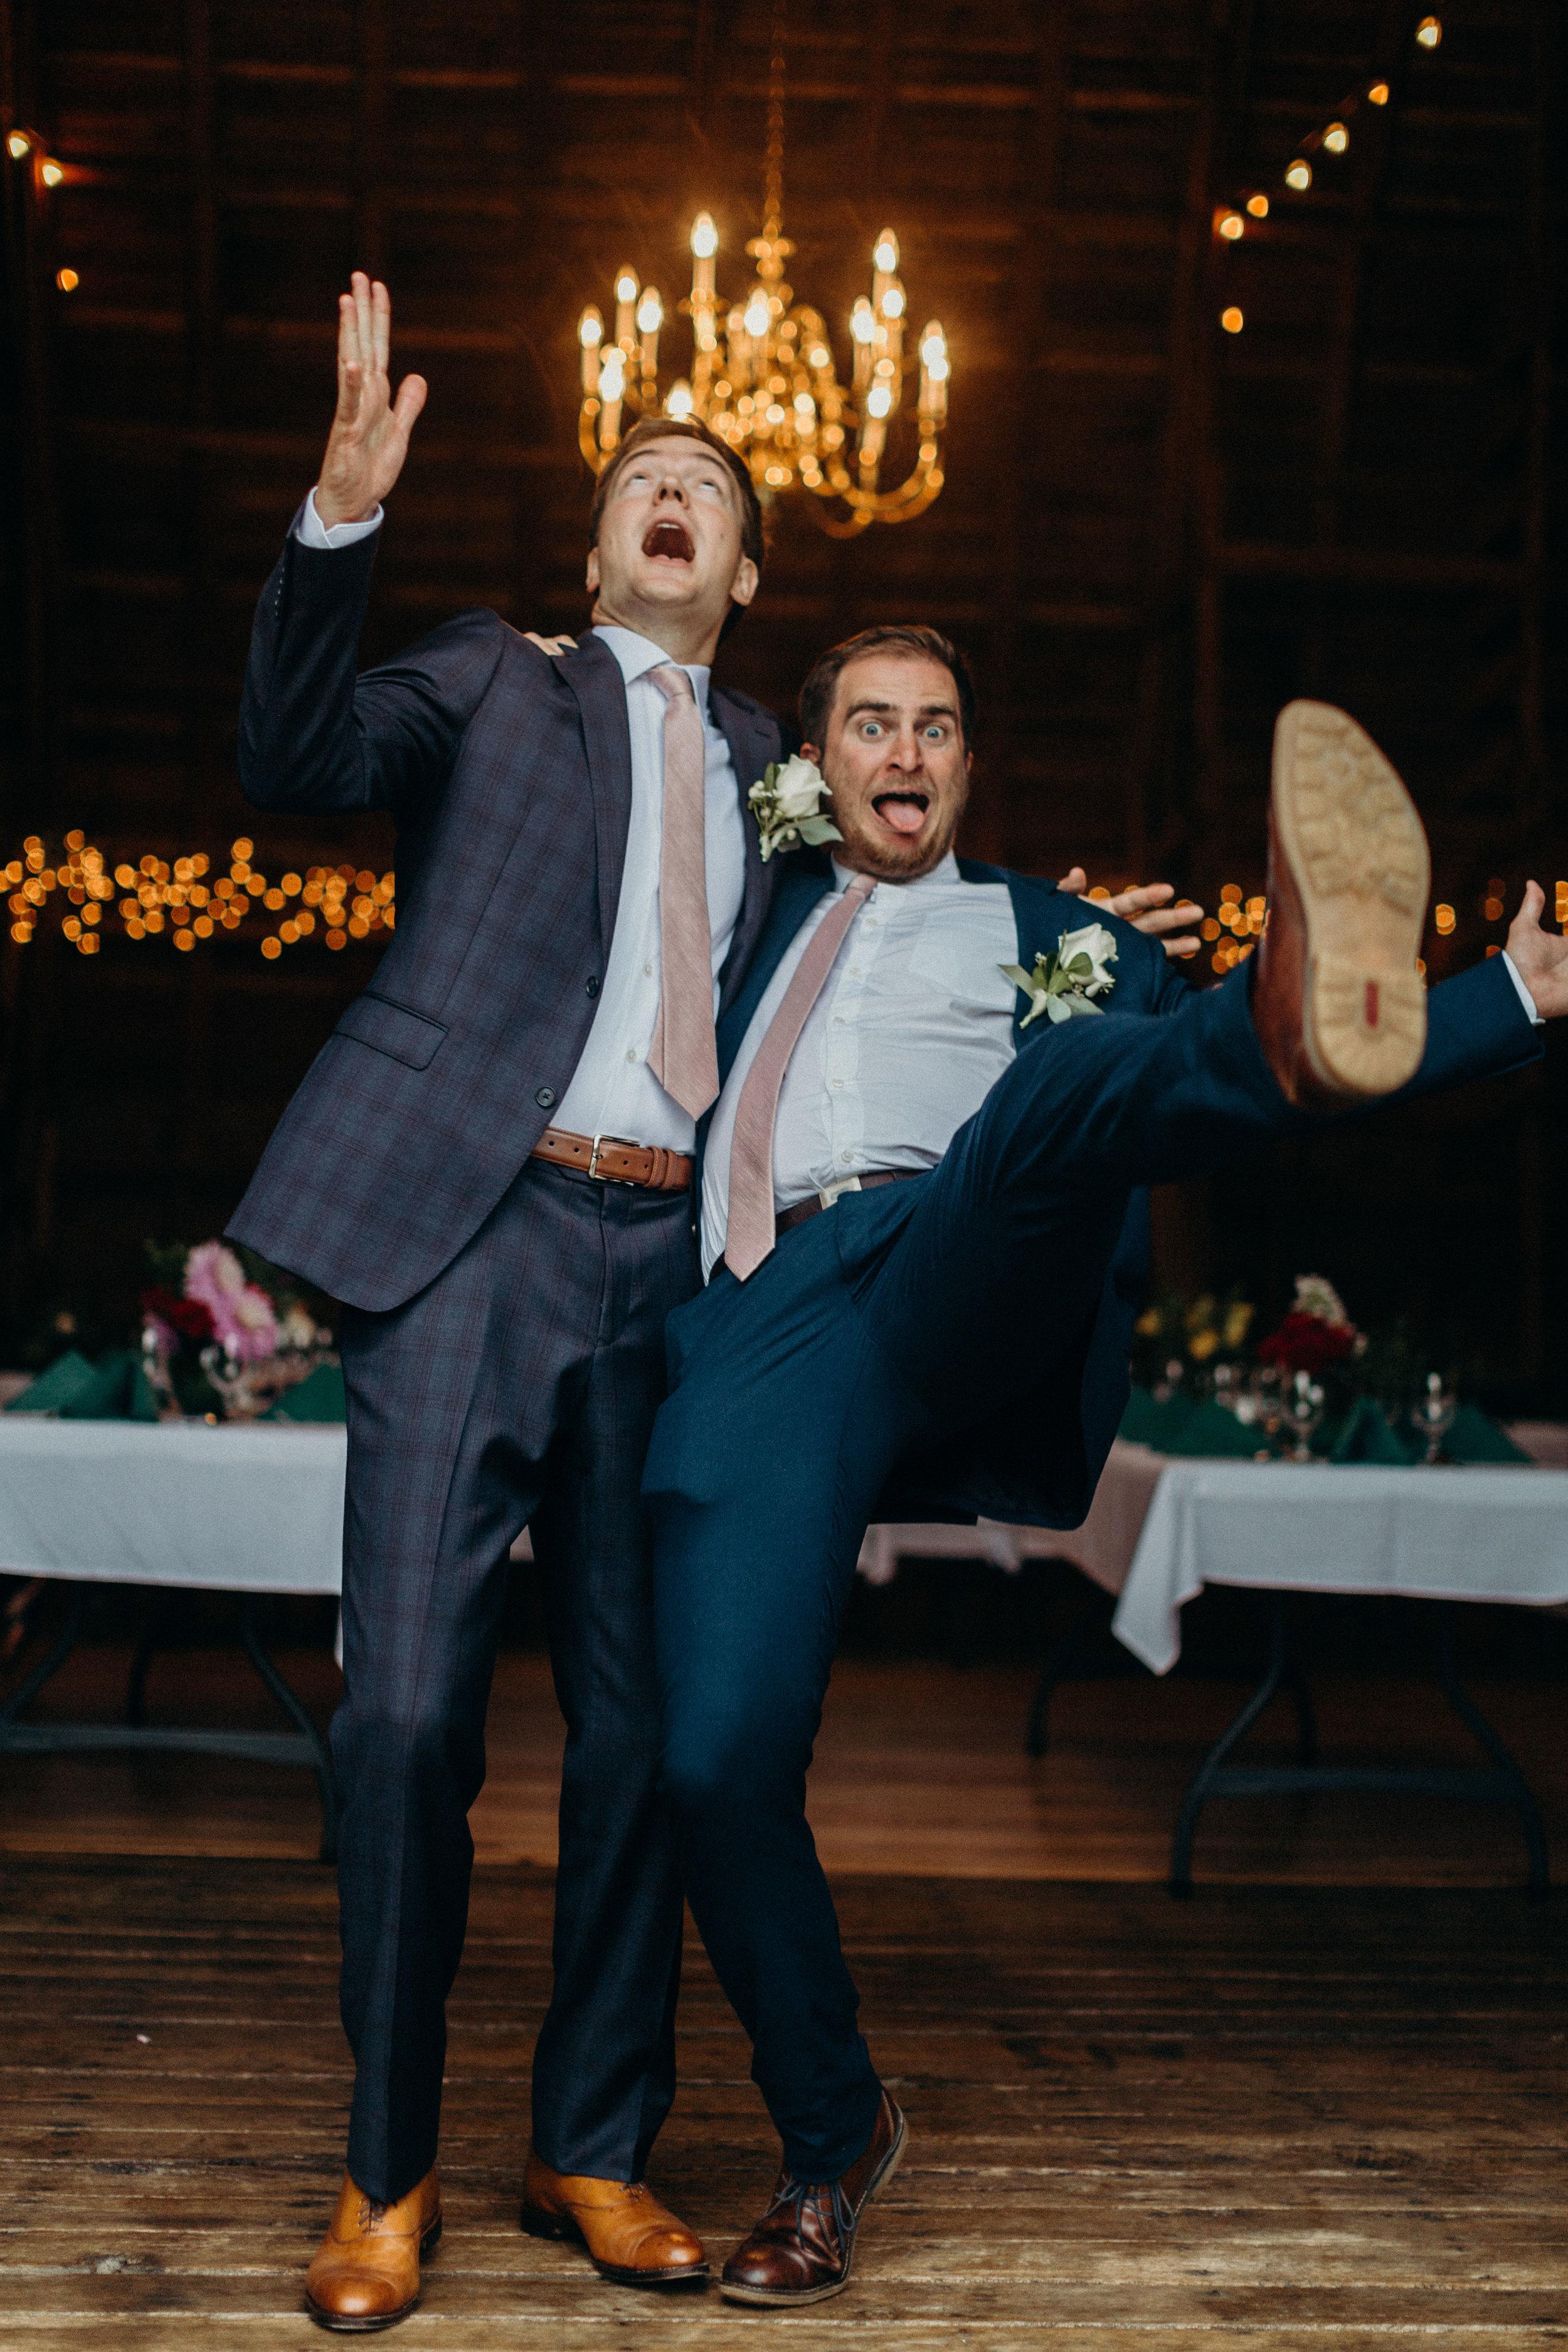 Groom  and his groomsman